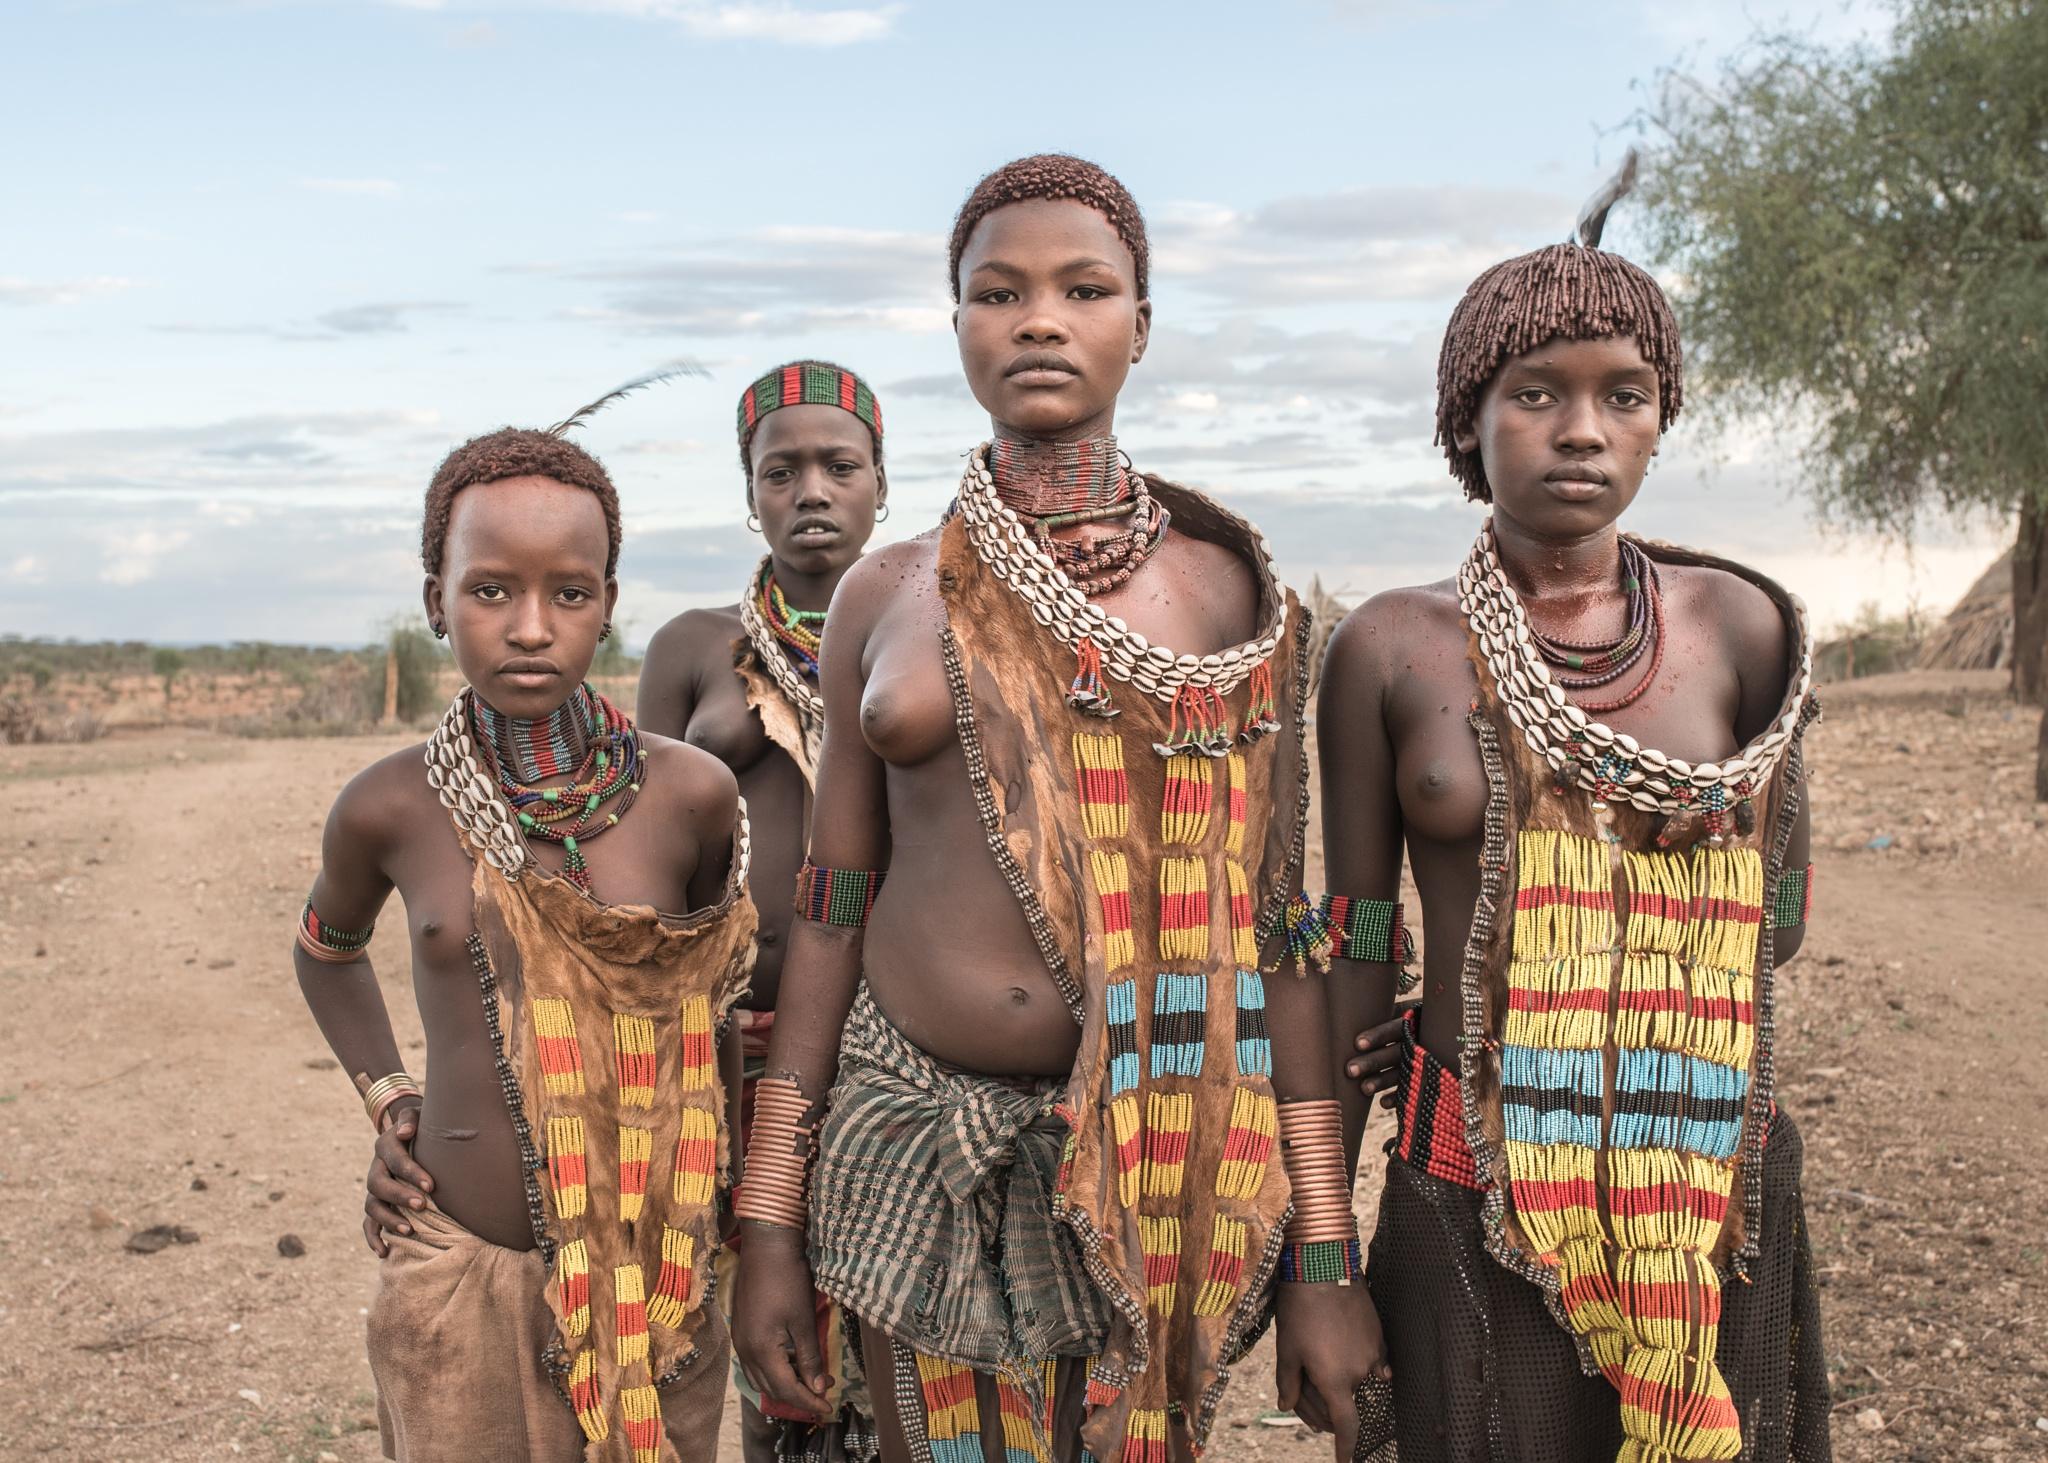 tribe girls by Tomasz Solinski